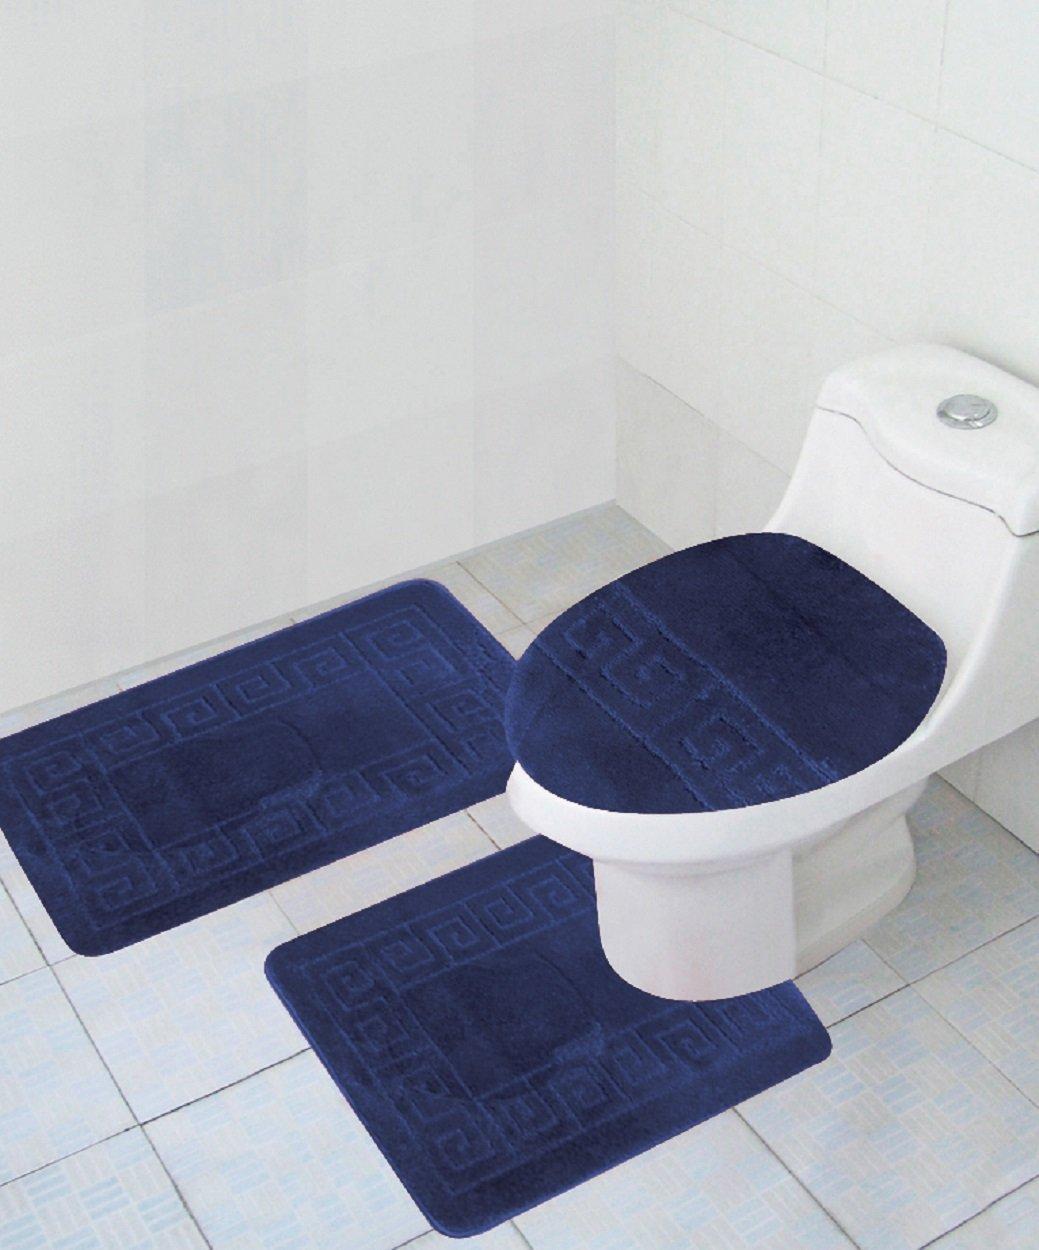 Cheap Bath Mats, find Bath Mats deals on line at Alibaba.com